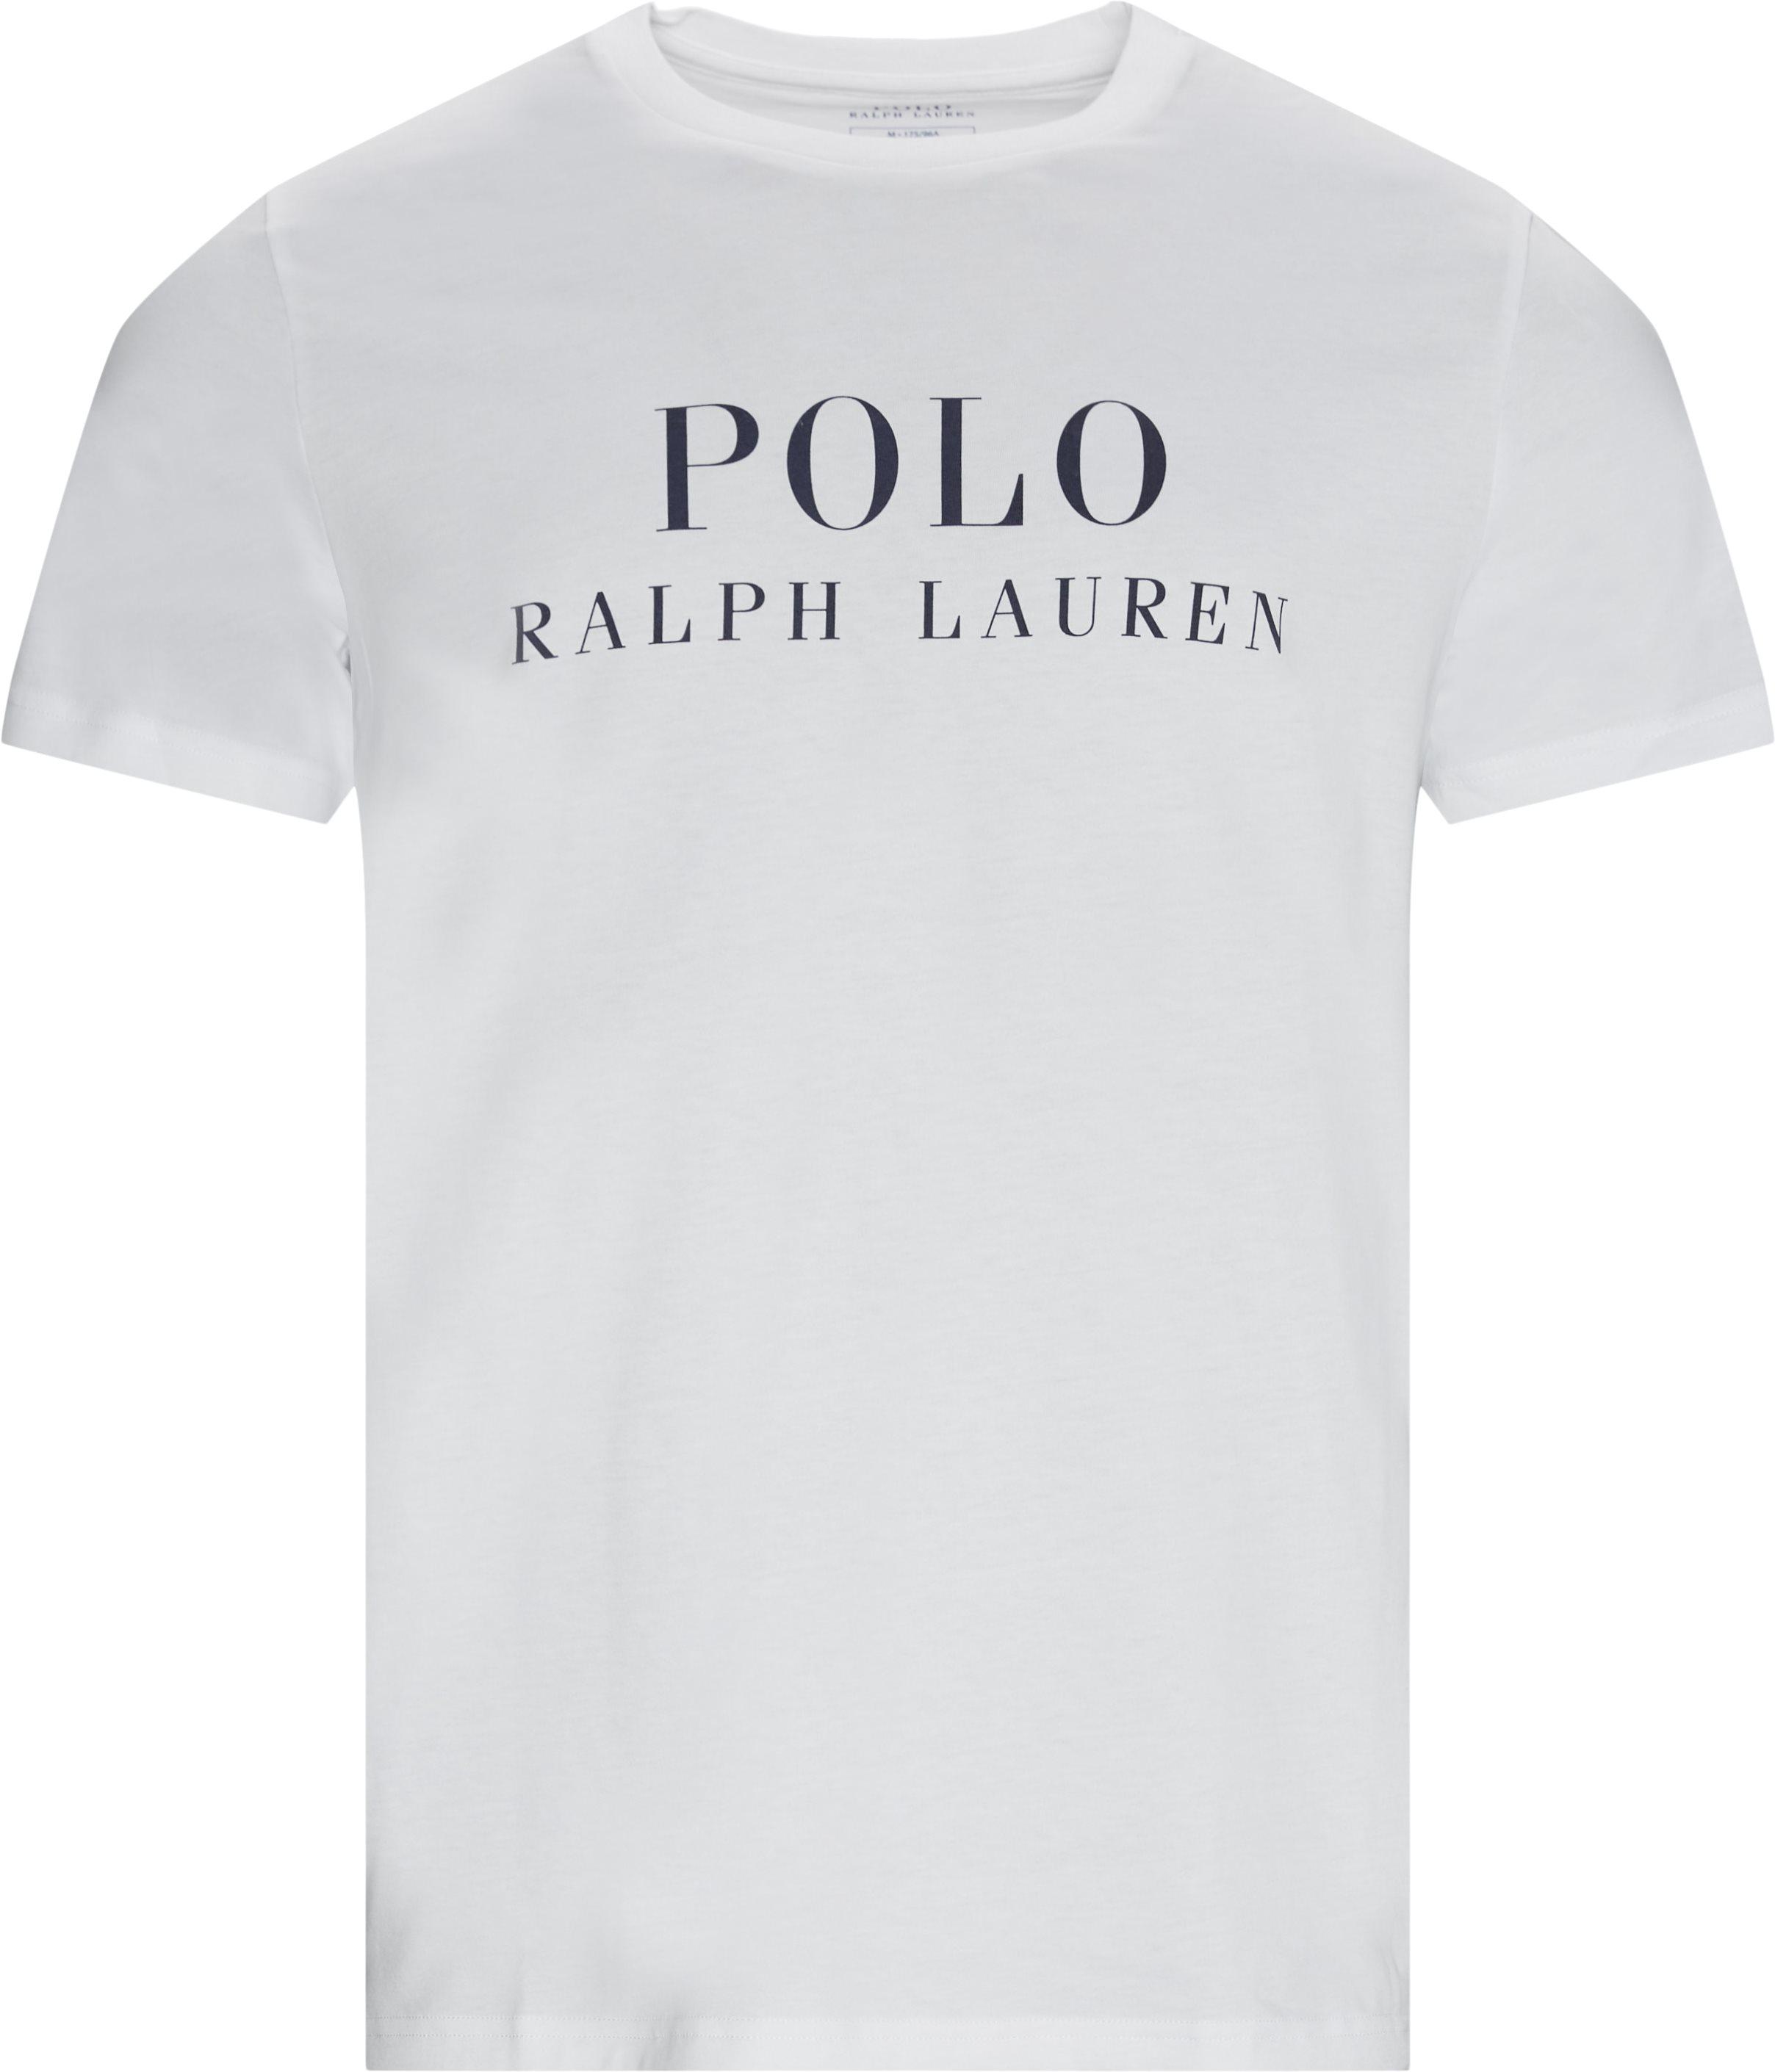 714830278 T-Shirt - T-shirts - Regular fit - Hvid